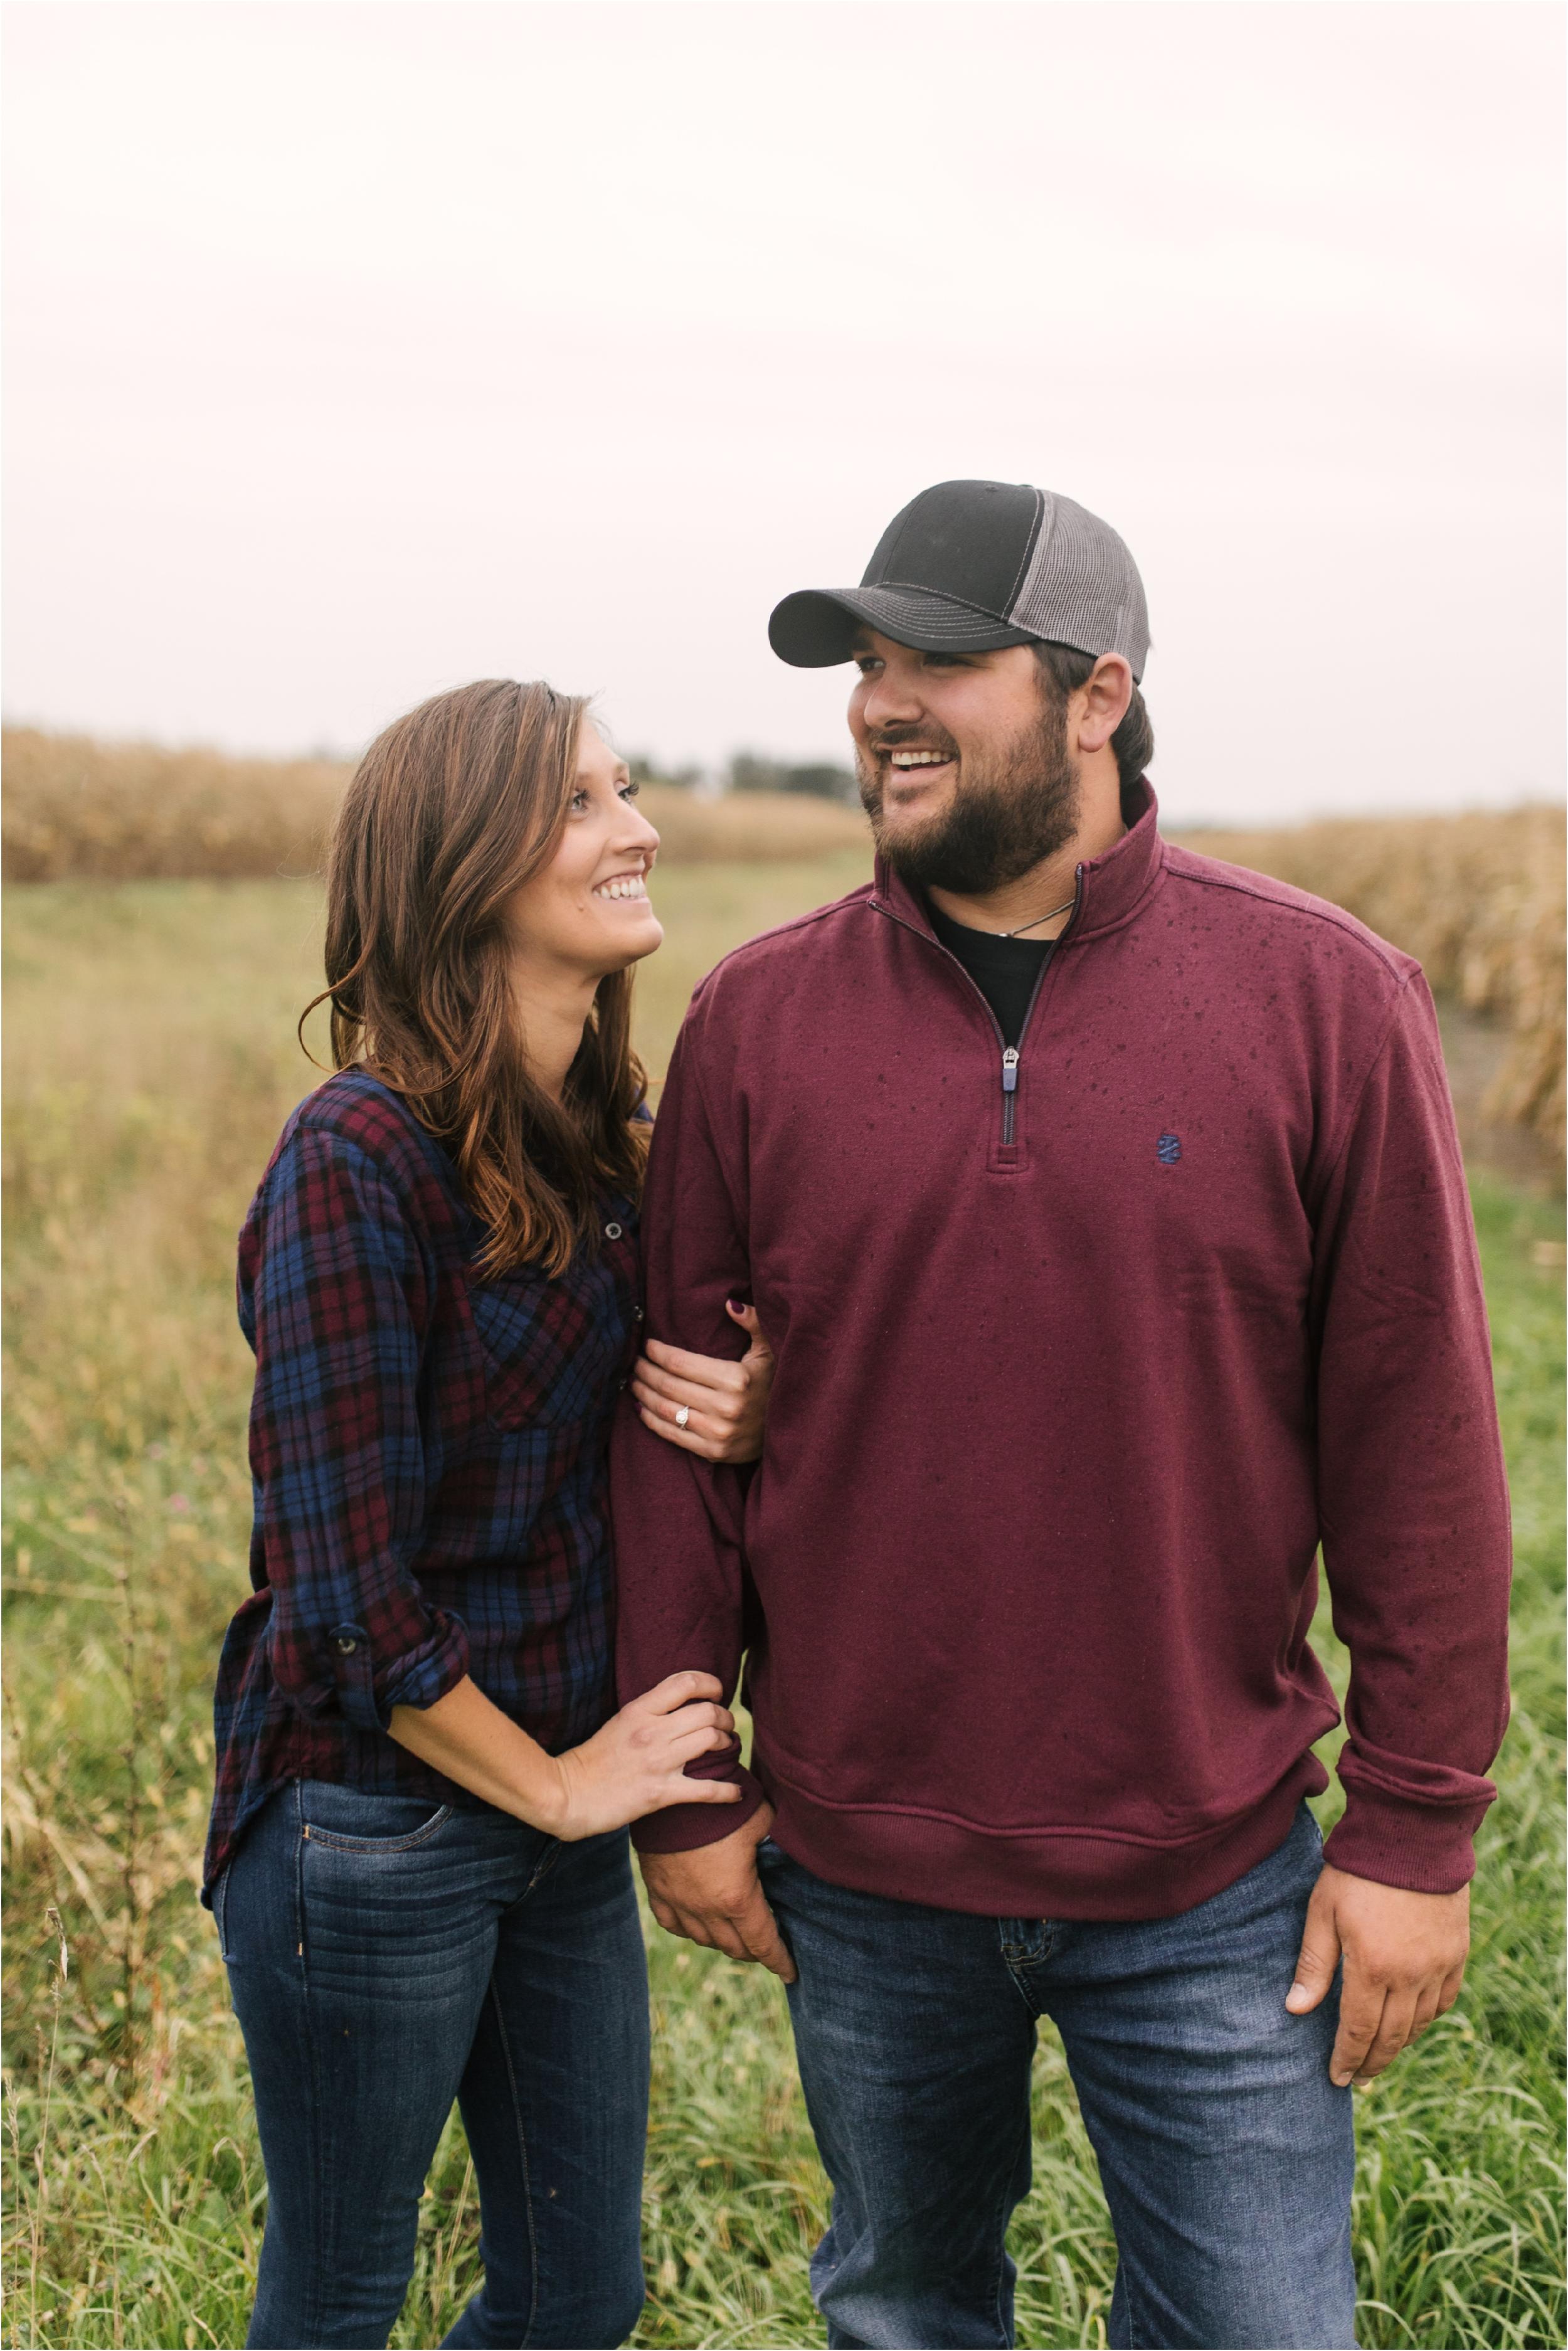 Countryside Engagement Photos_ Minnesota Wedding Photographer_Stephanie Lynn Photography_0071.jpg